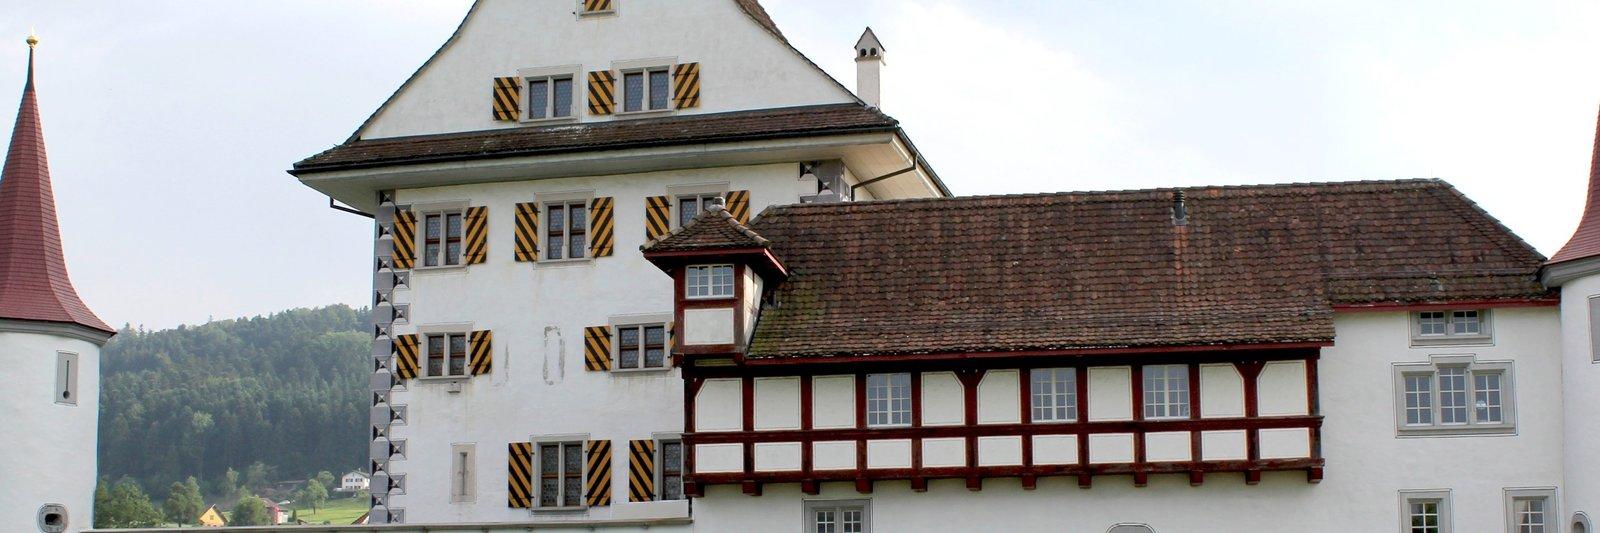 Raiffeisenbank Ettiswil